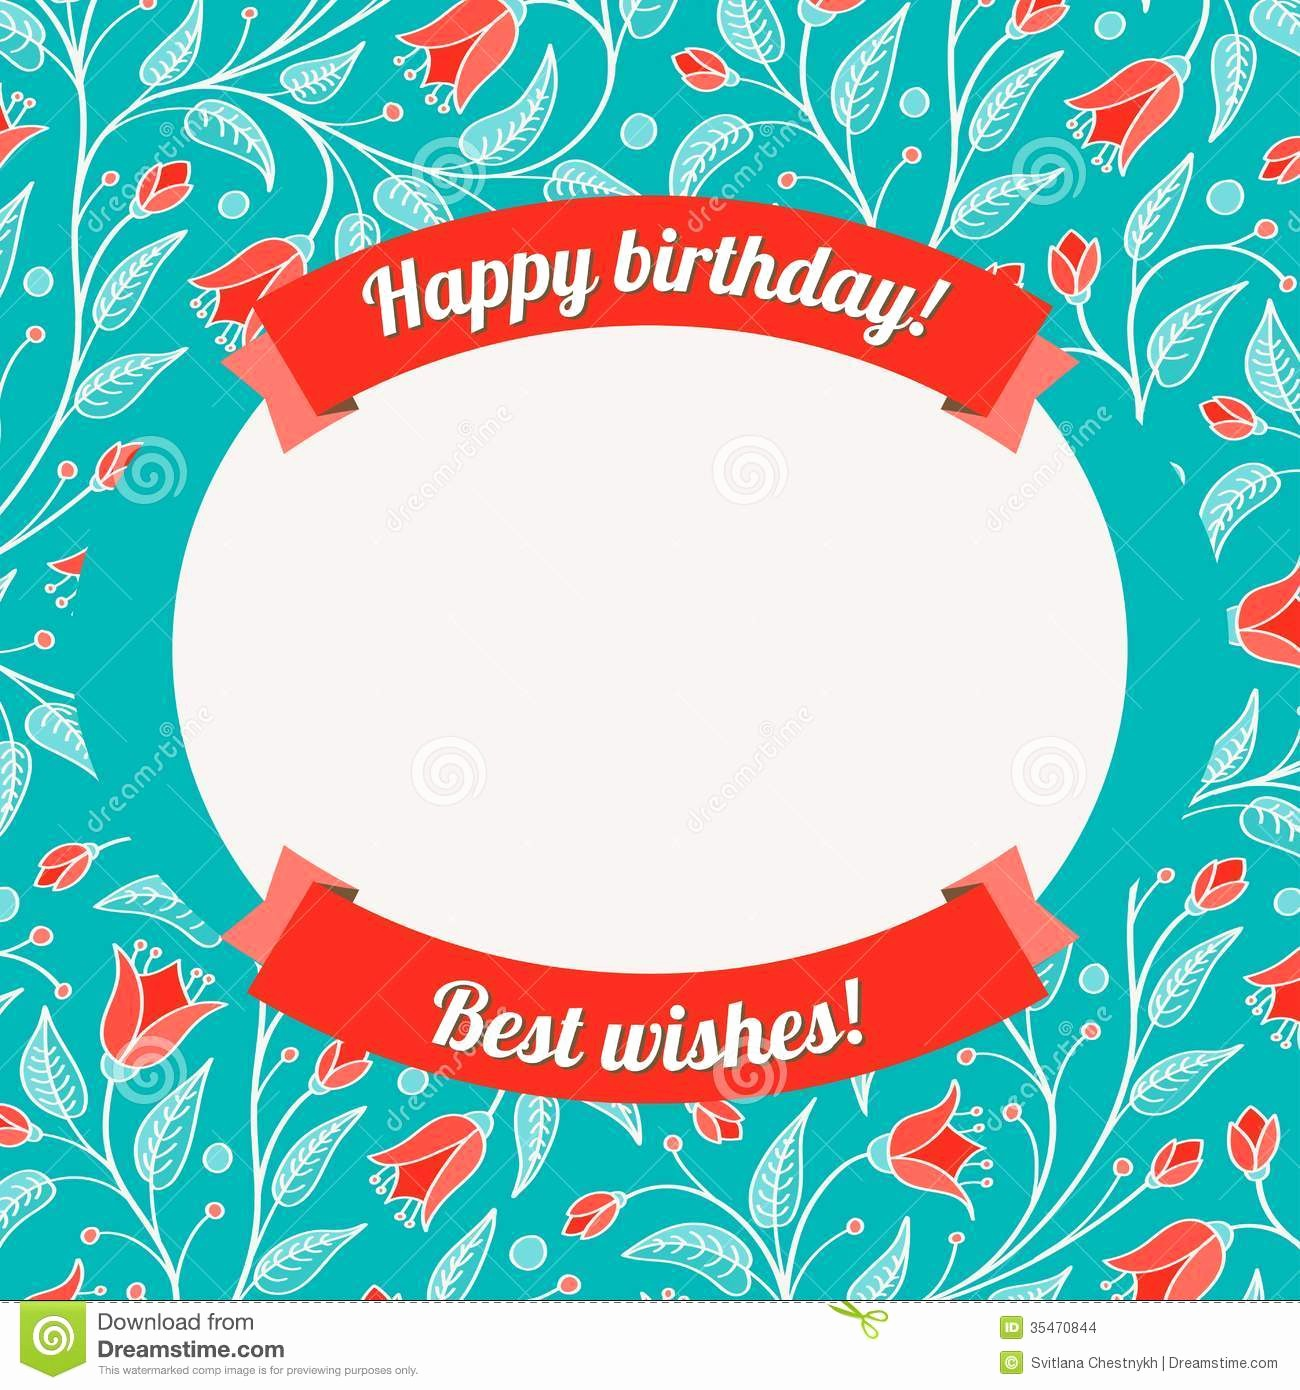 Ms Word Birthday Card Template New Card Birthday Card Template